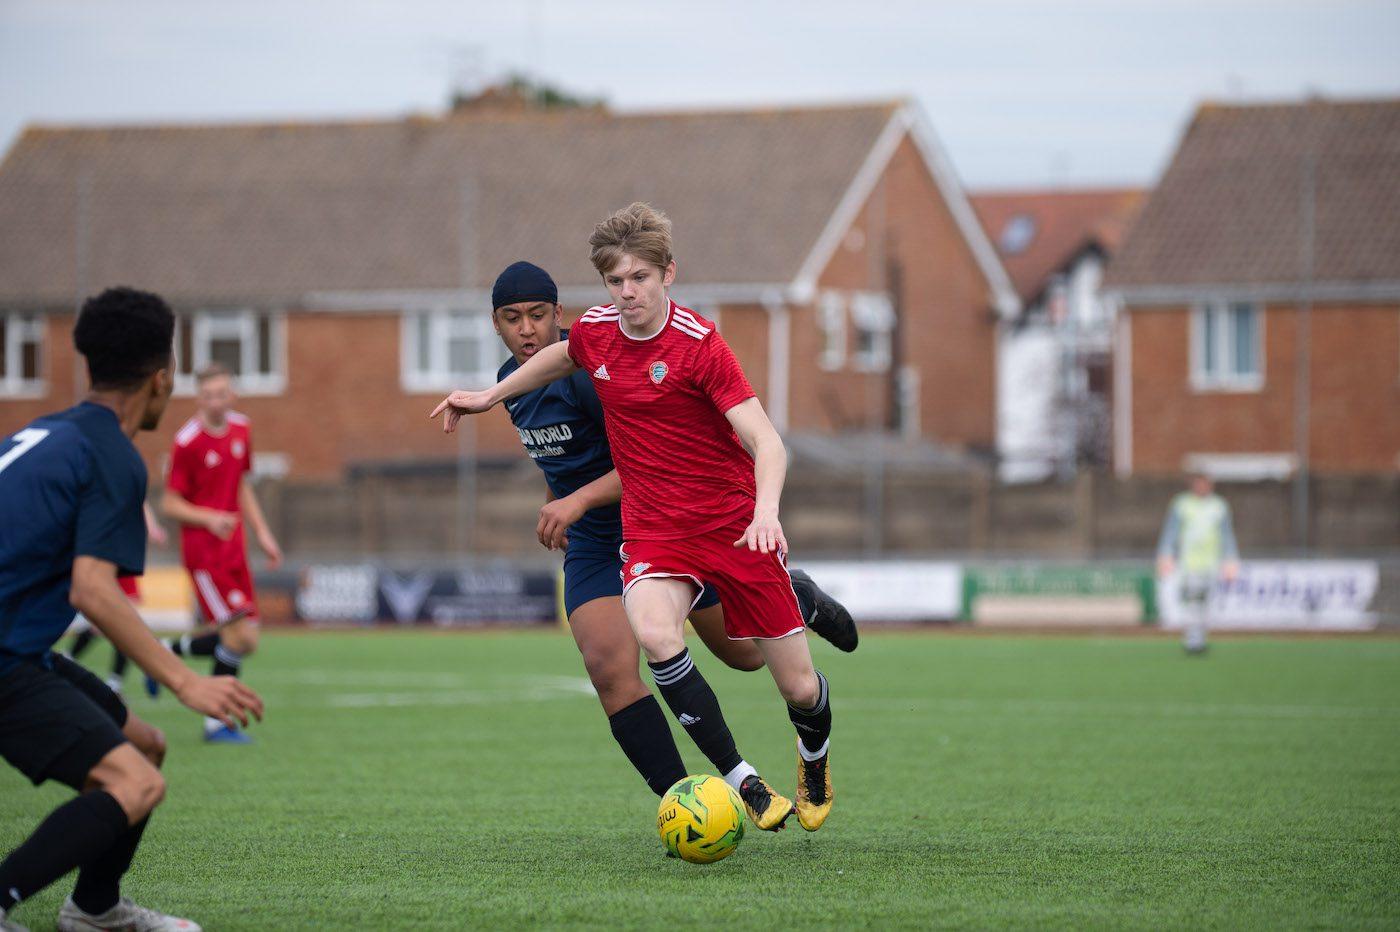 Read the full article - HIGHLIGHTS: Academy 3-2 Carshalton Athletic [H] – League